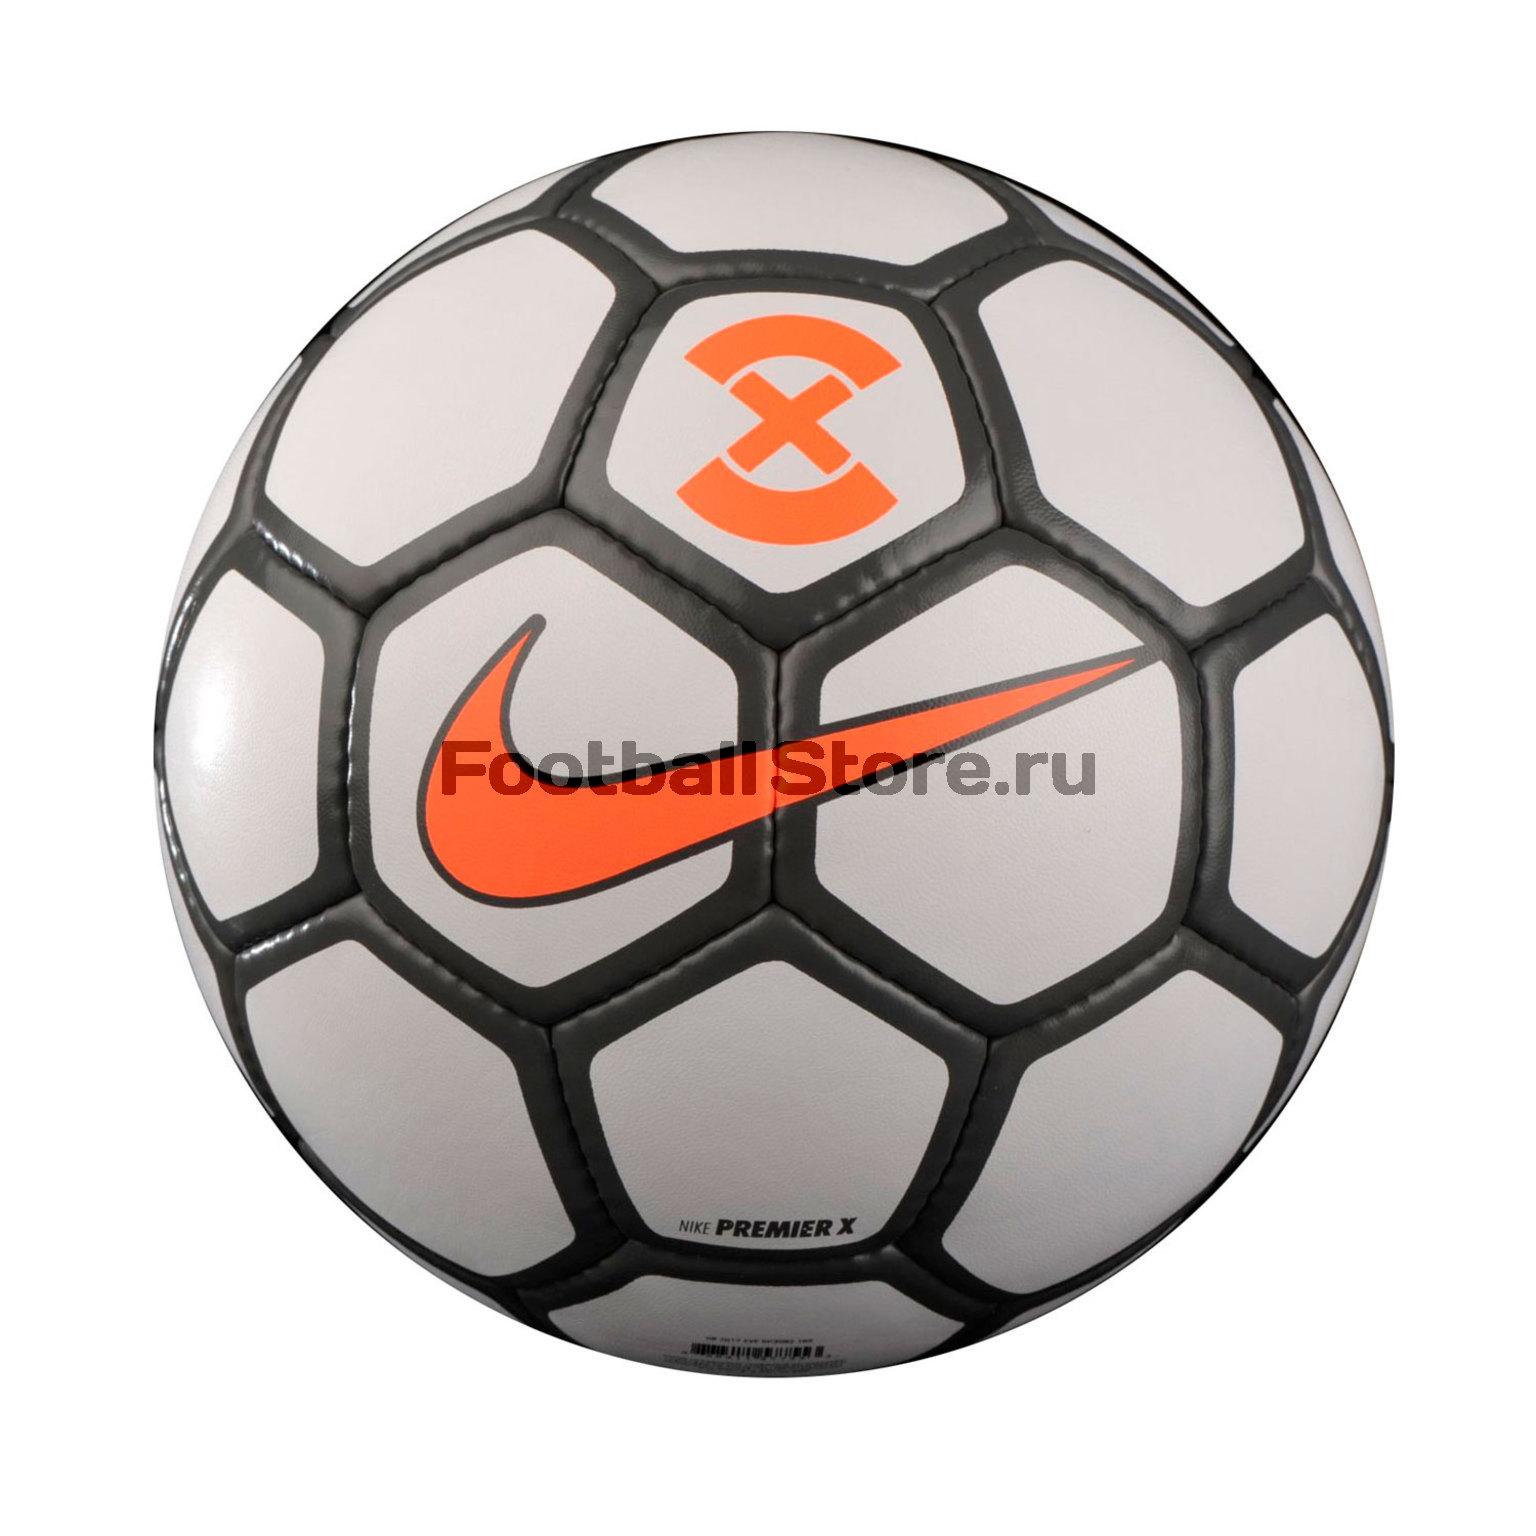 Футзальный мяч Nike Premier X SC3092-102 мяч футбольный nike premier х sc3092 102 р 4 fifa quality pro